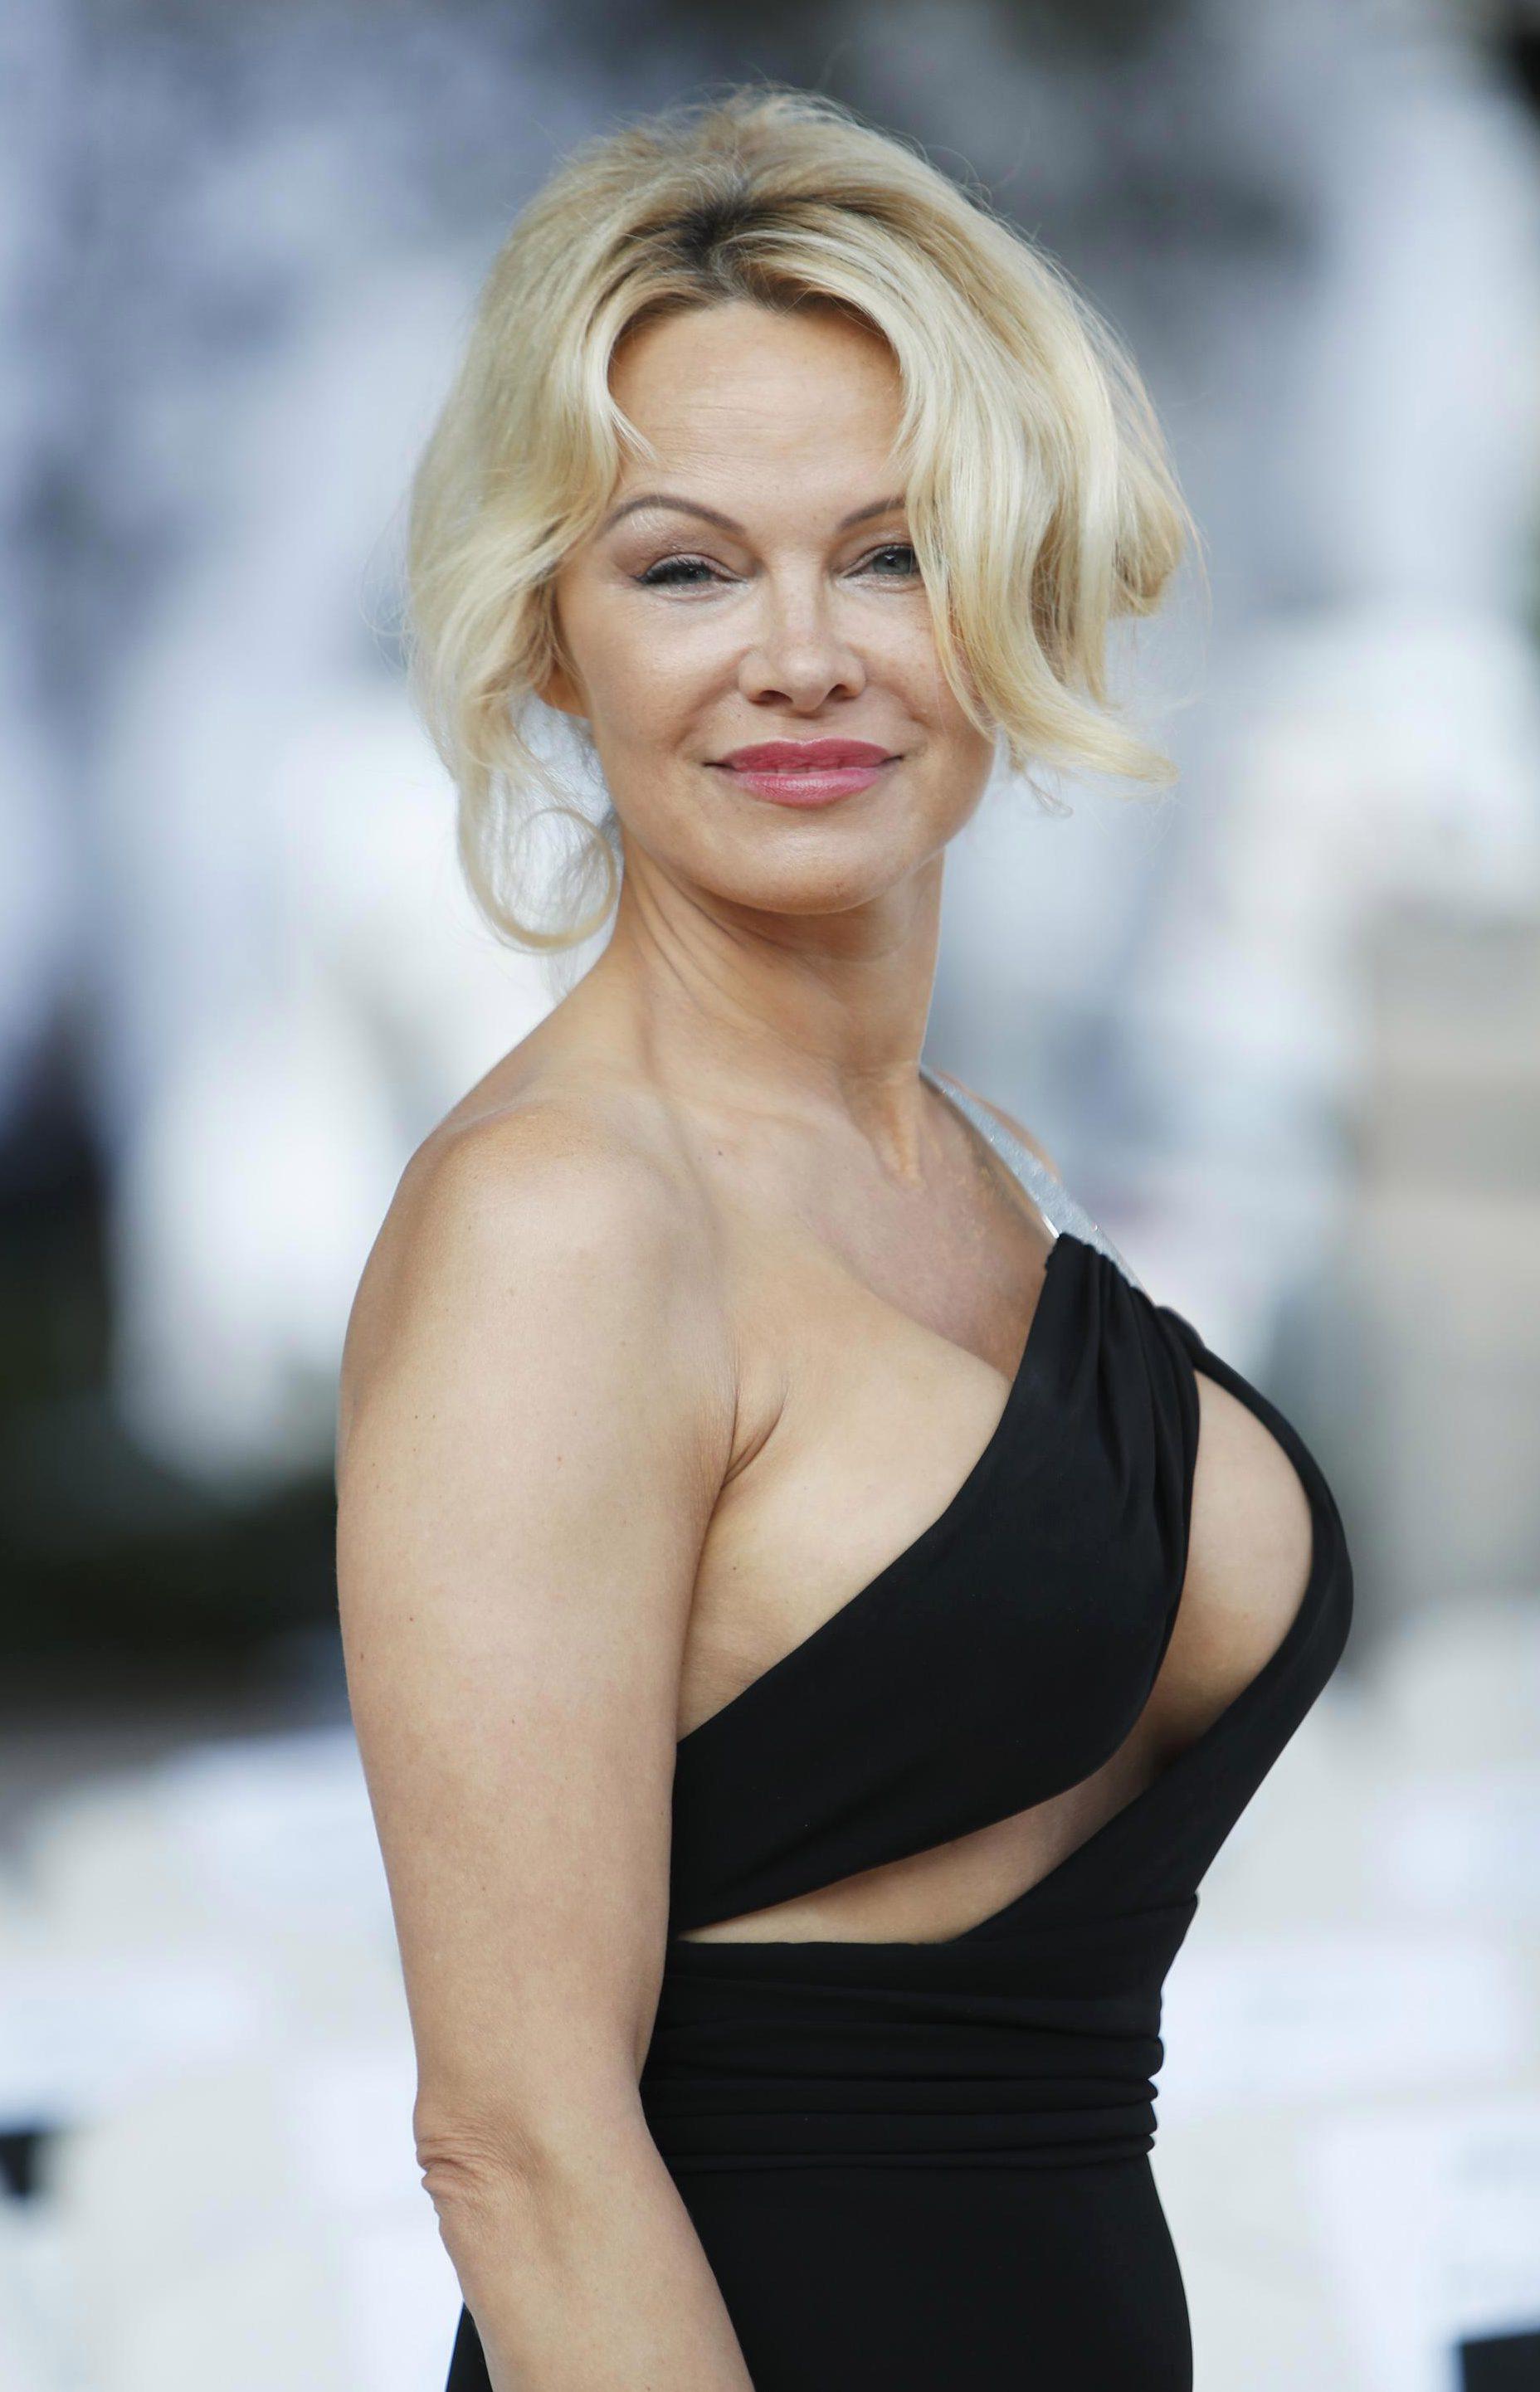 Pamela Anderson Broke Off Her 12 Days Old Marriage